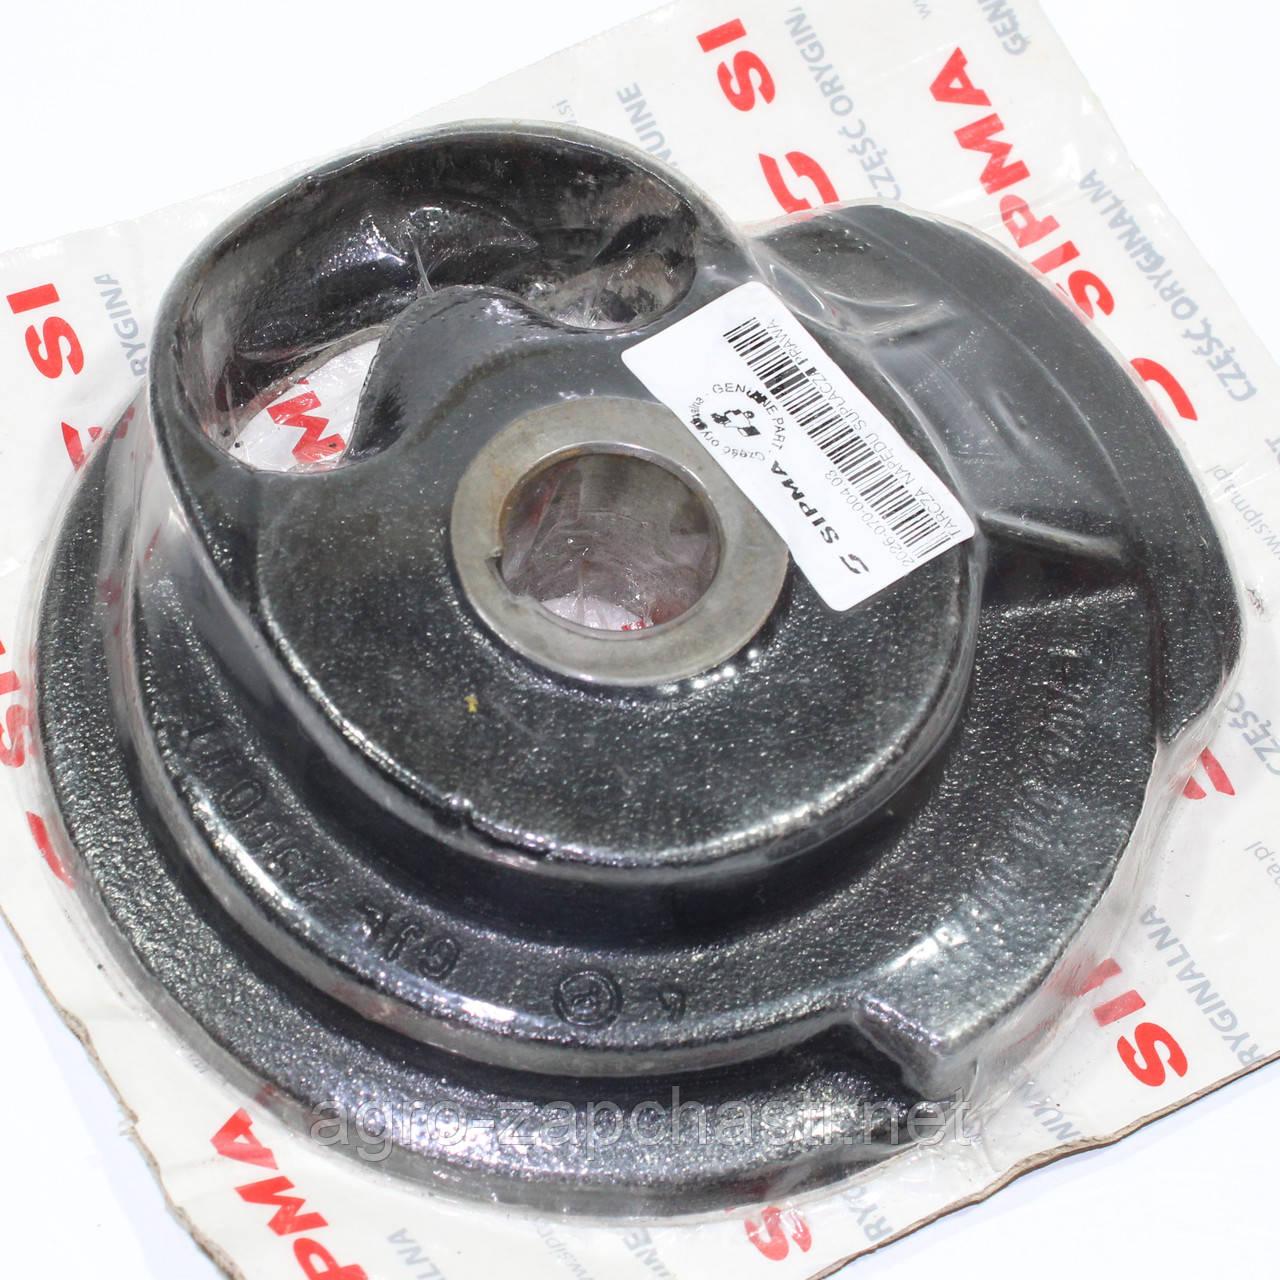 Тарелка (диск, ступица) привода вязального аппарата пресс-подборщика Sipma - правая [Оригинал] 2026-070-004.03